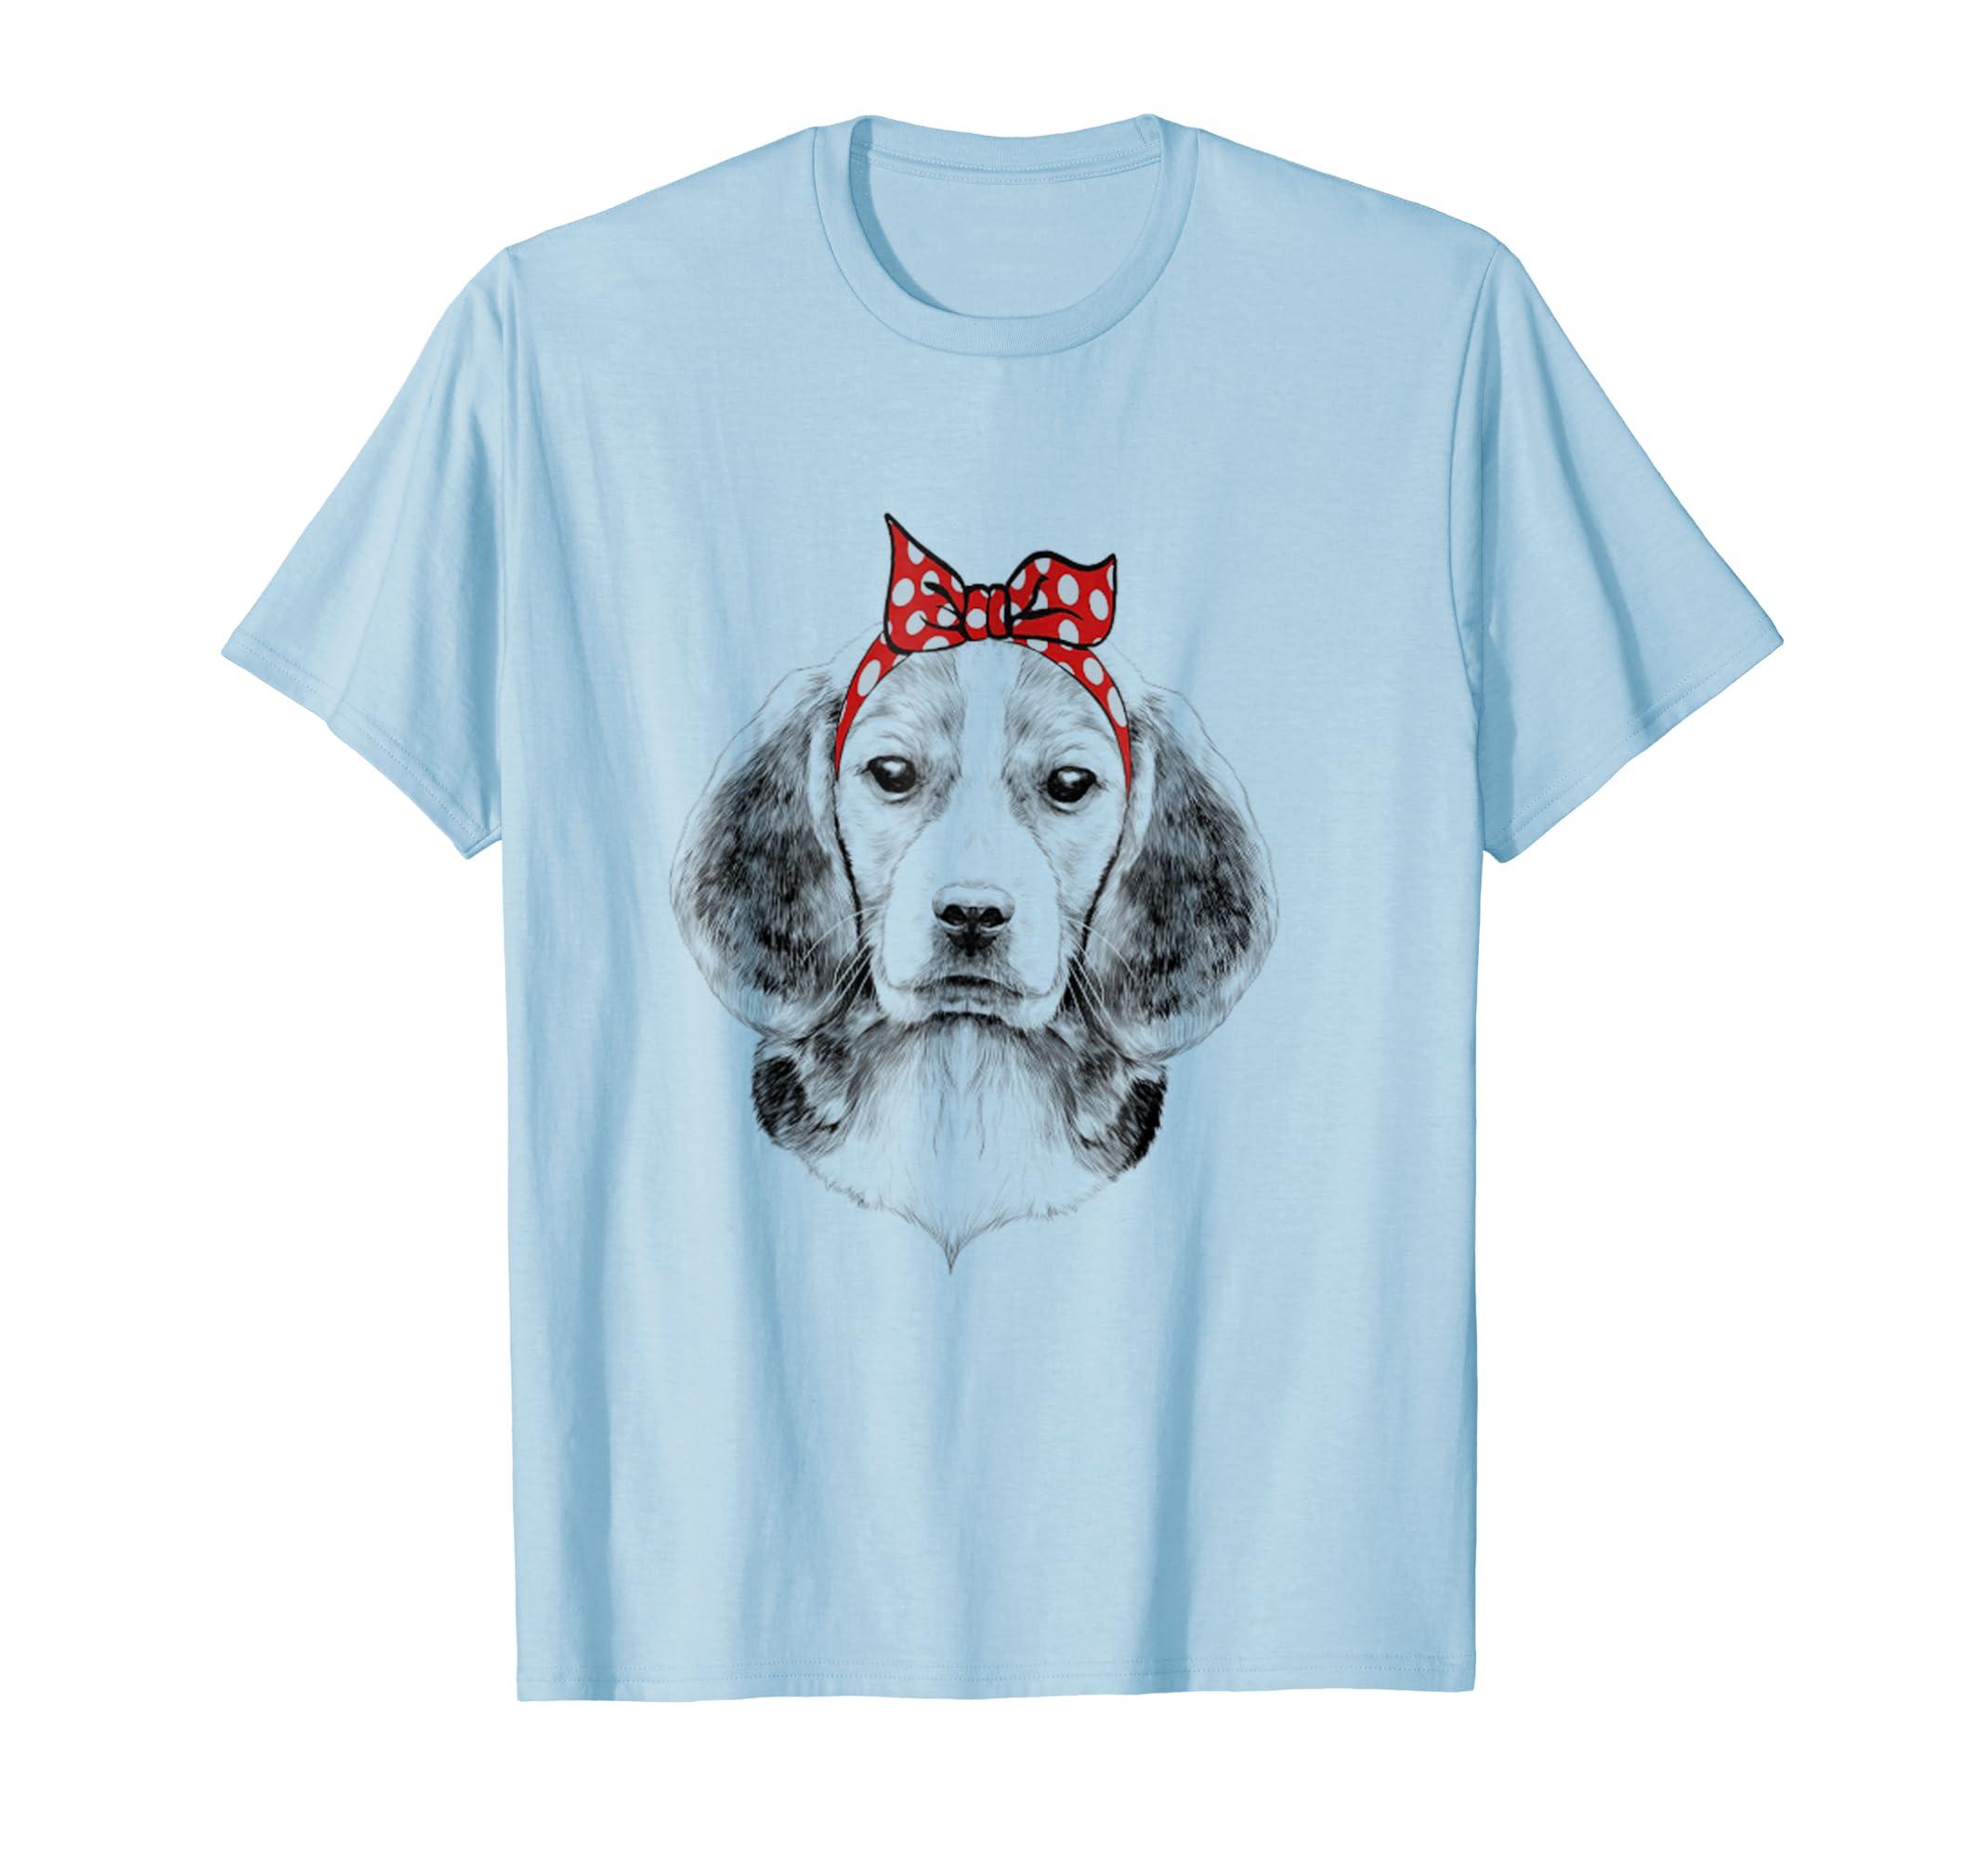 Beagle Dog Face Graphic Art T-Shirt-AZP